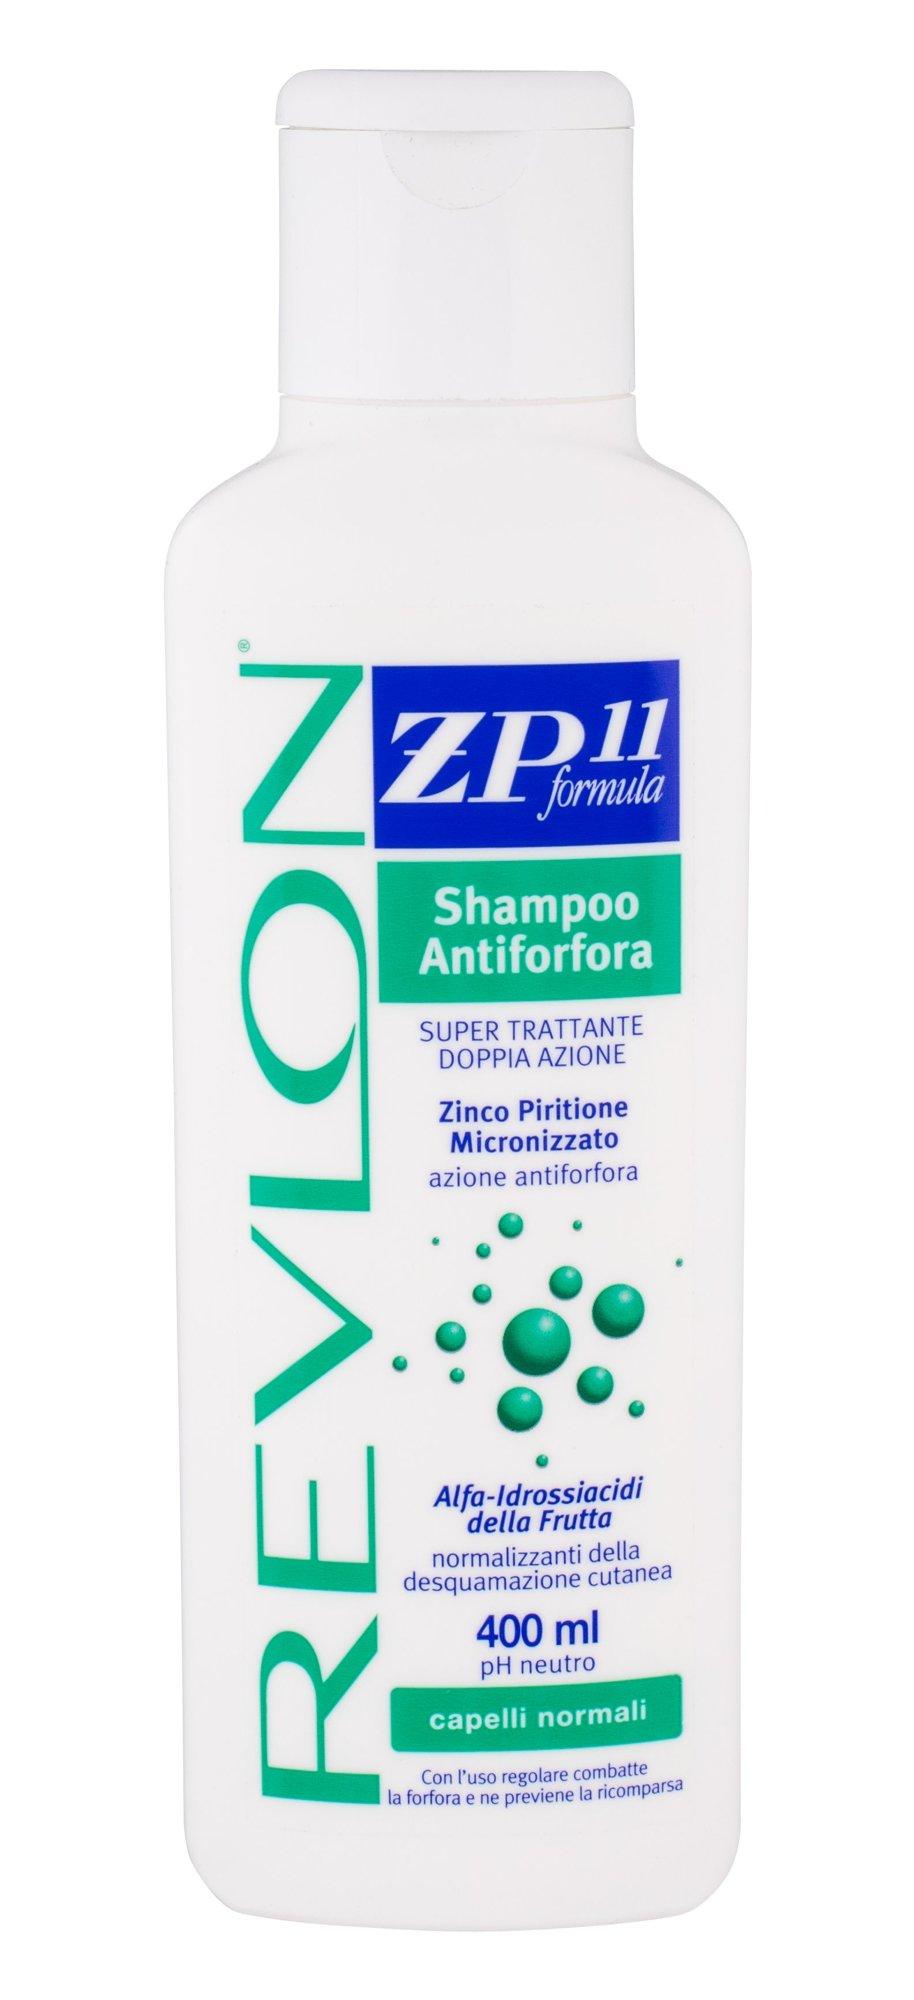 Revlon Professional ZP11 Formula Shampoo Antiforfora